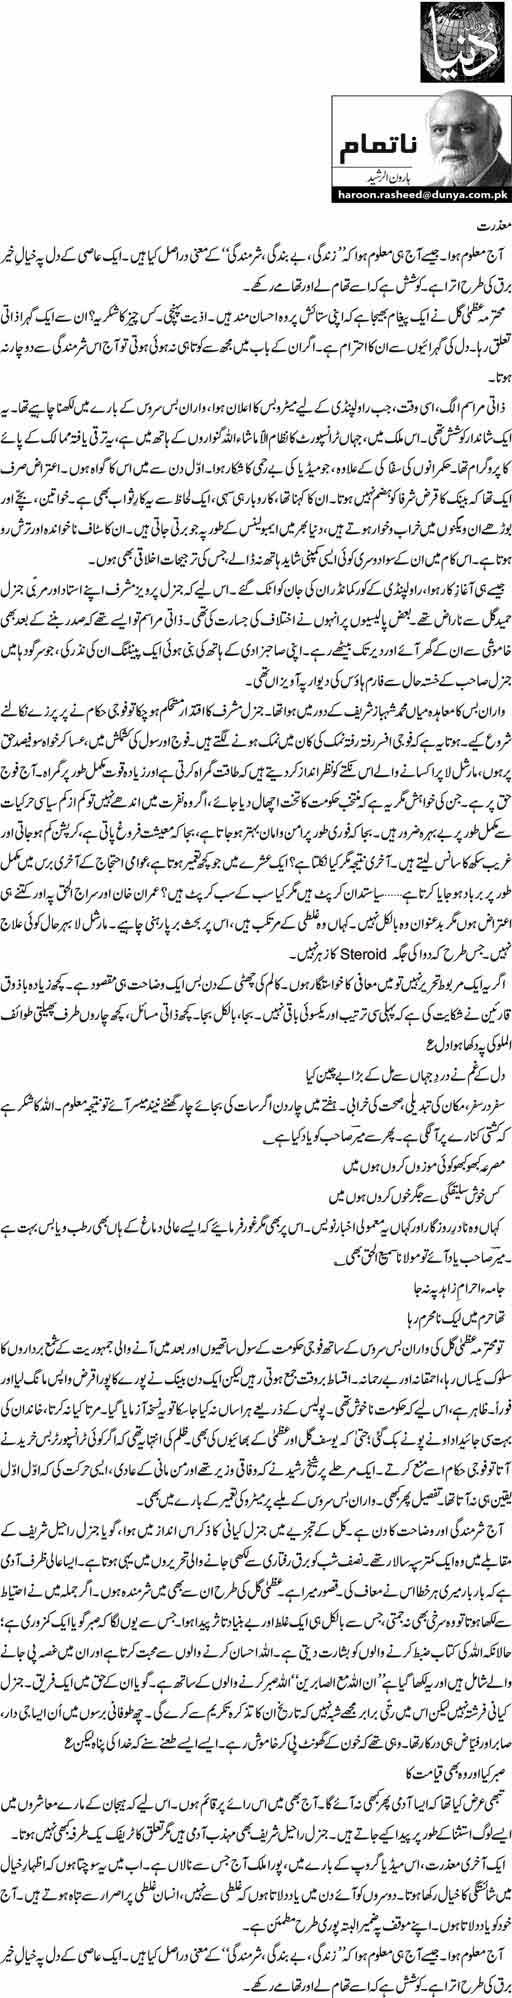 Mazrat - Haroon ur Rasheed